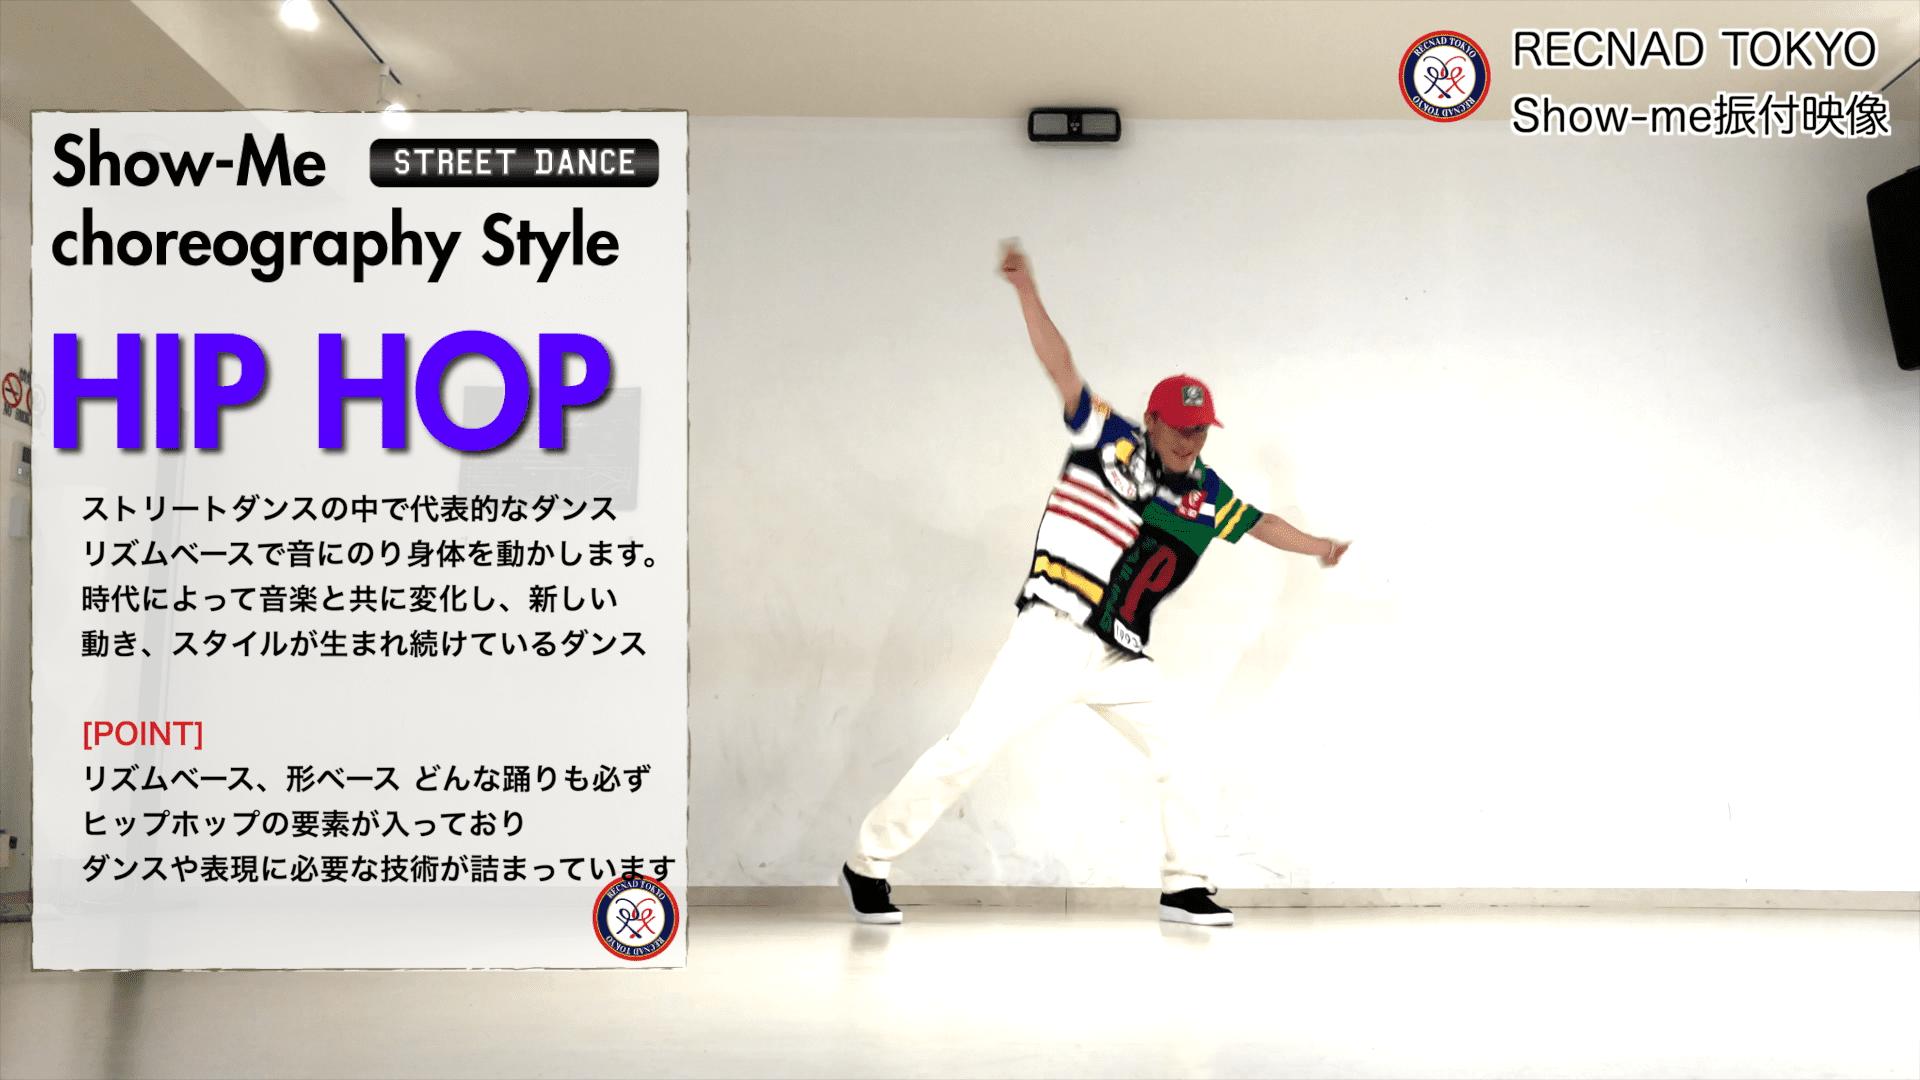 HIP HOP ヒップホップ 振付依頼 振付師キャスティング用 | ストリートダンス ジャンル別 振り付け